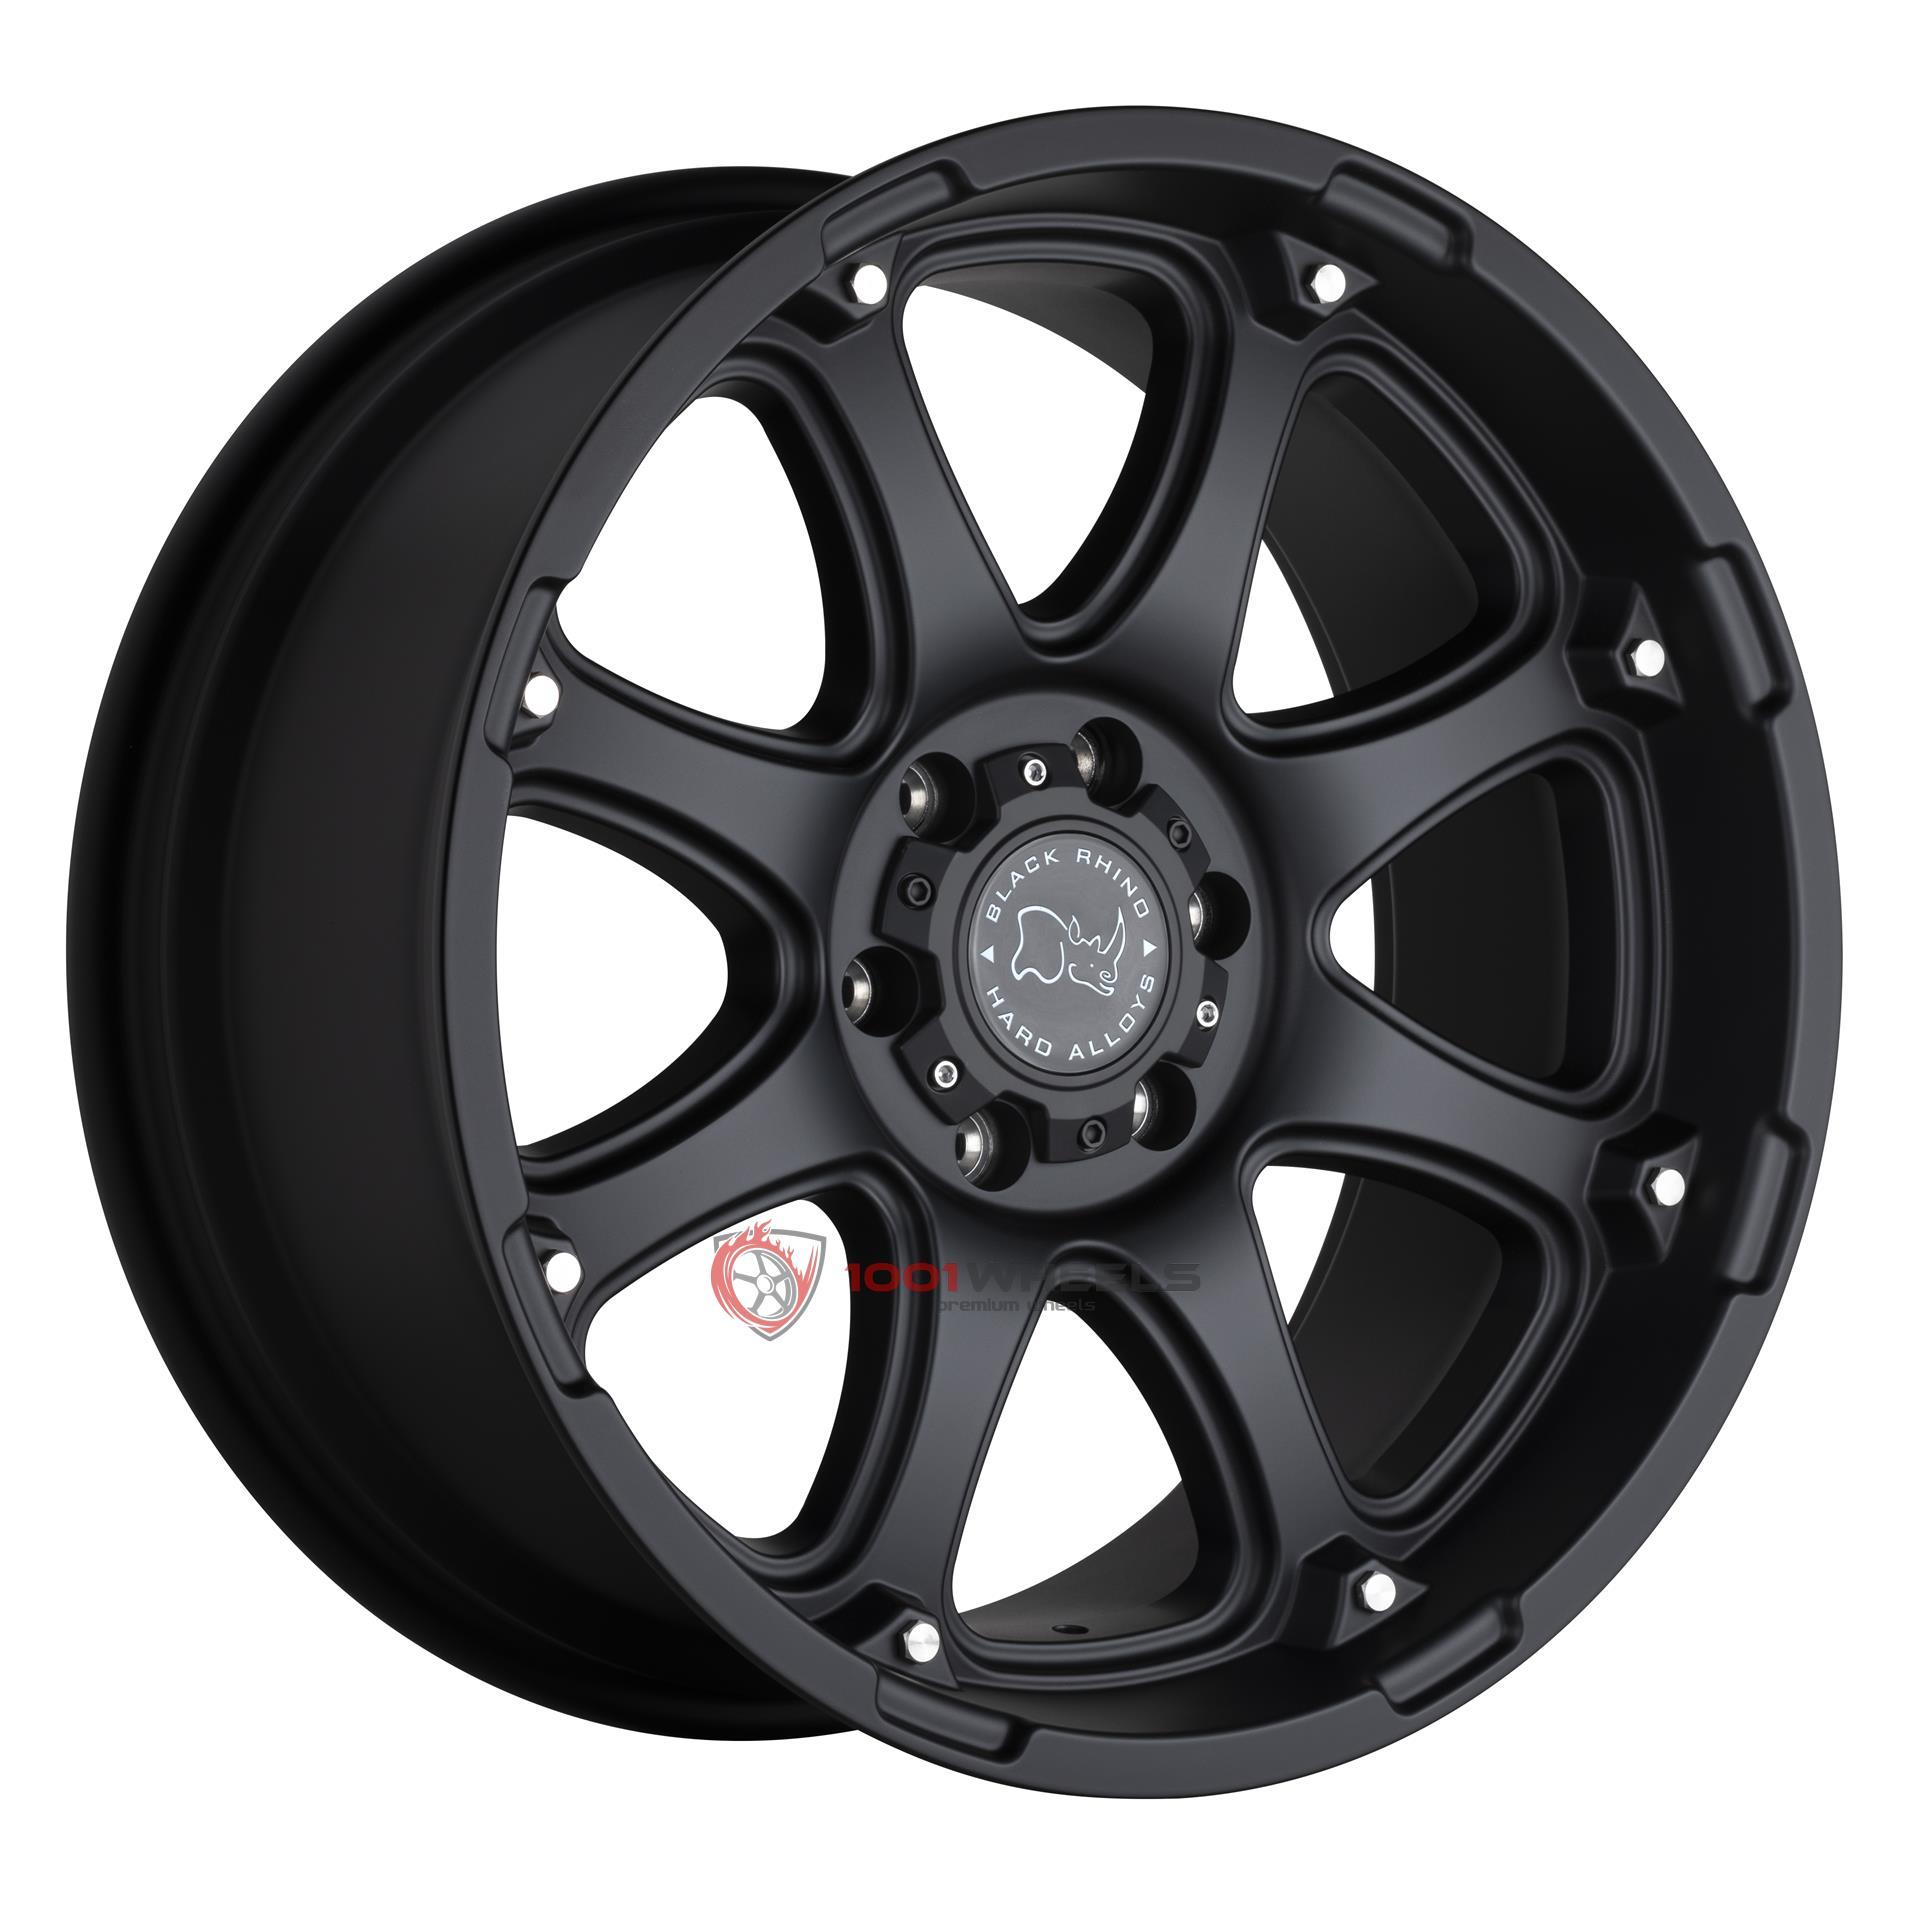 BLACK RHINO GLAMIS matte-black